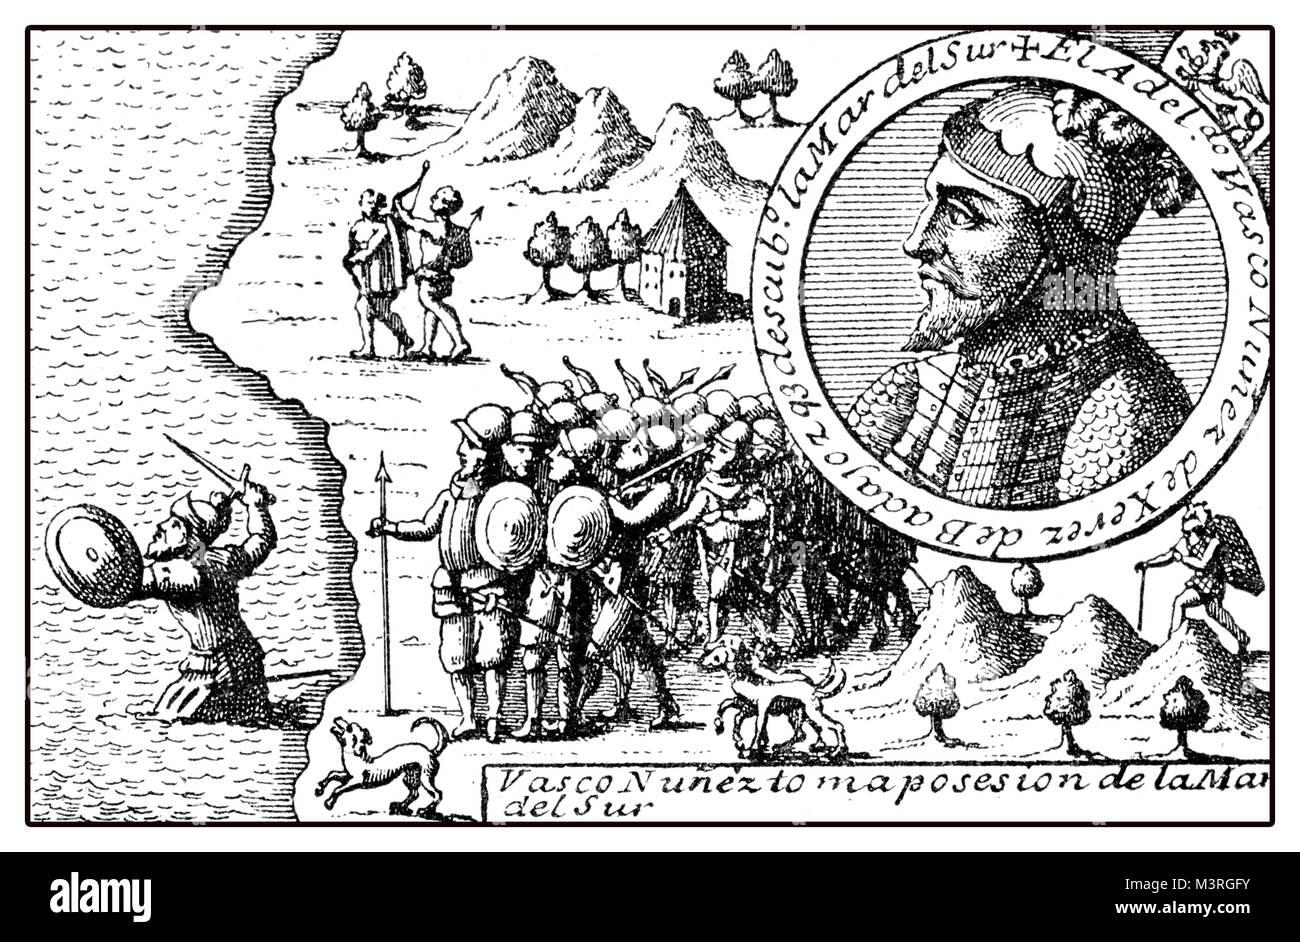 Allegoric representation of Vasco Nuñez de Balboa exploration of central America and the coast of Pacific ocean, - Stock Image